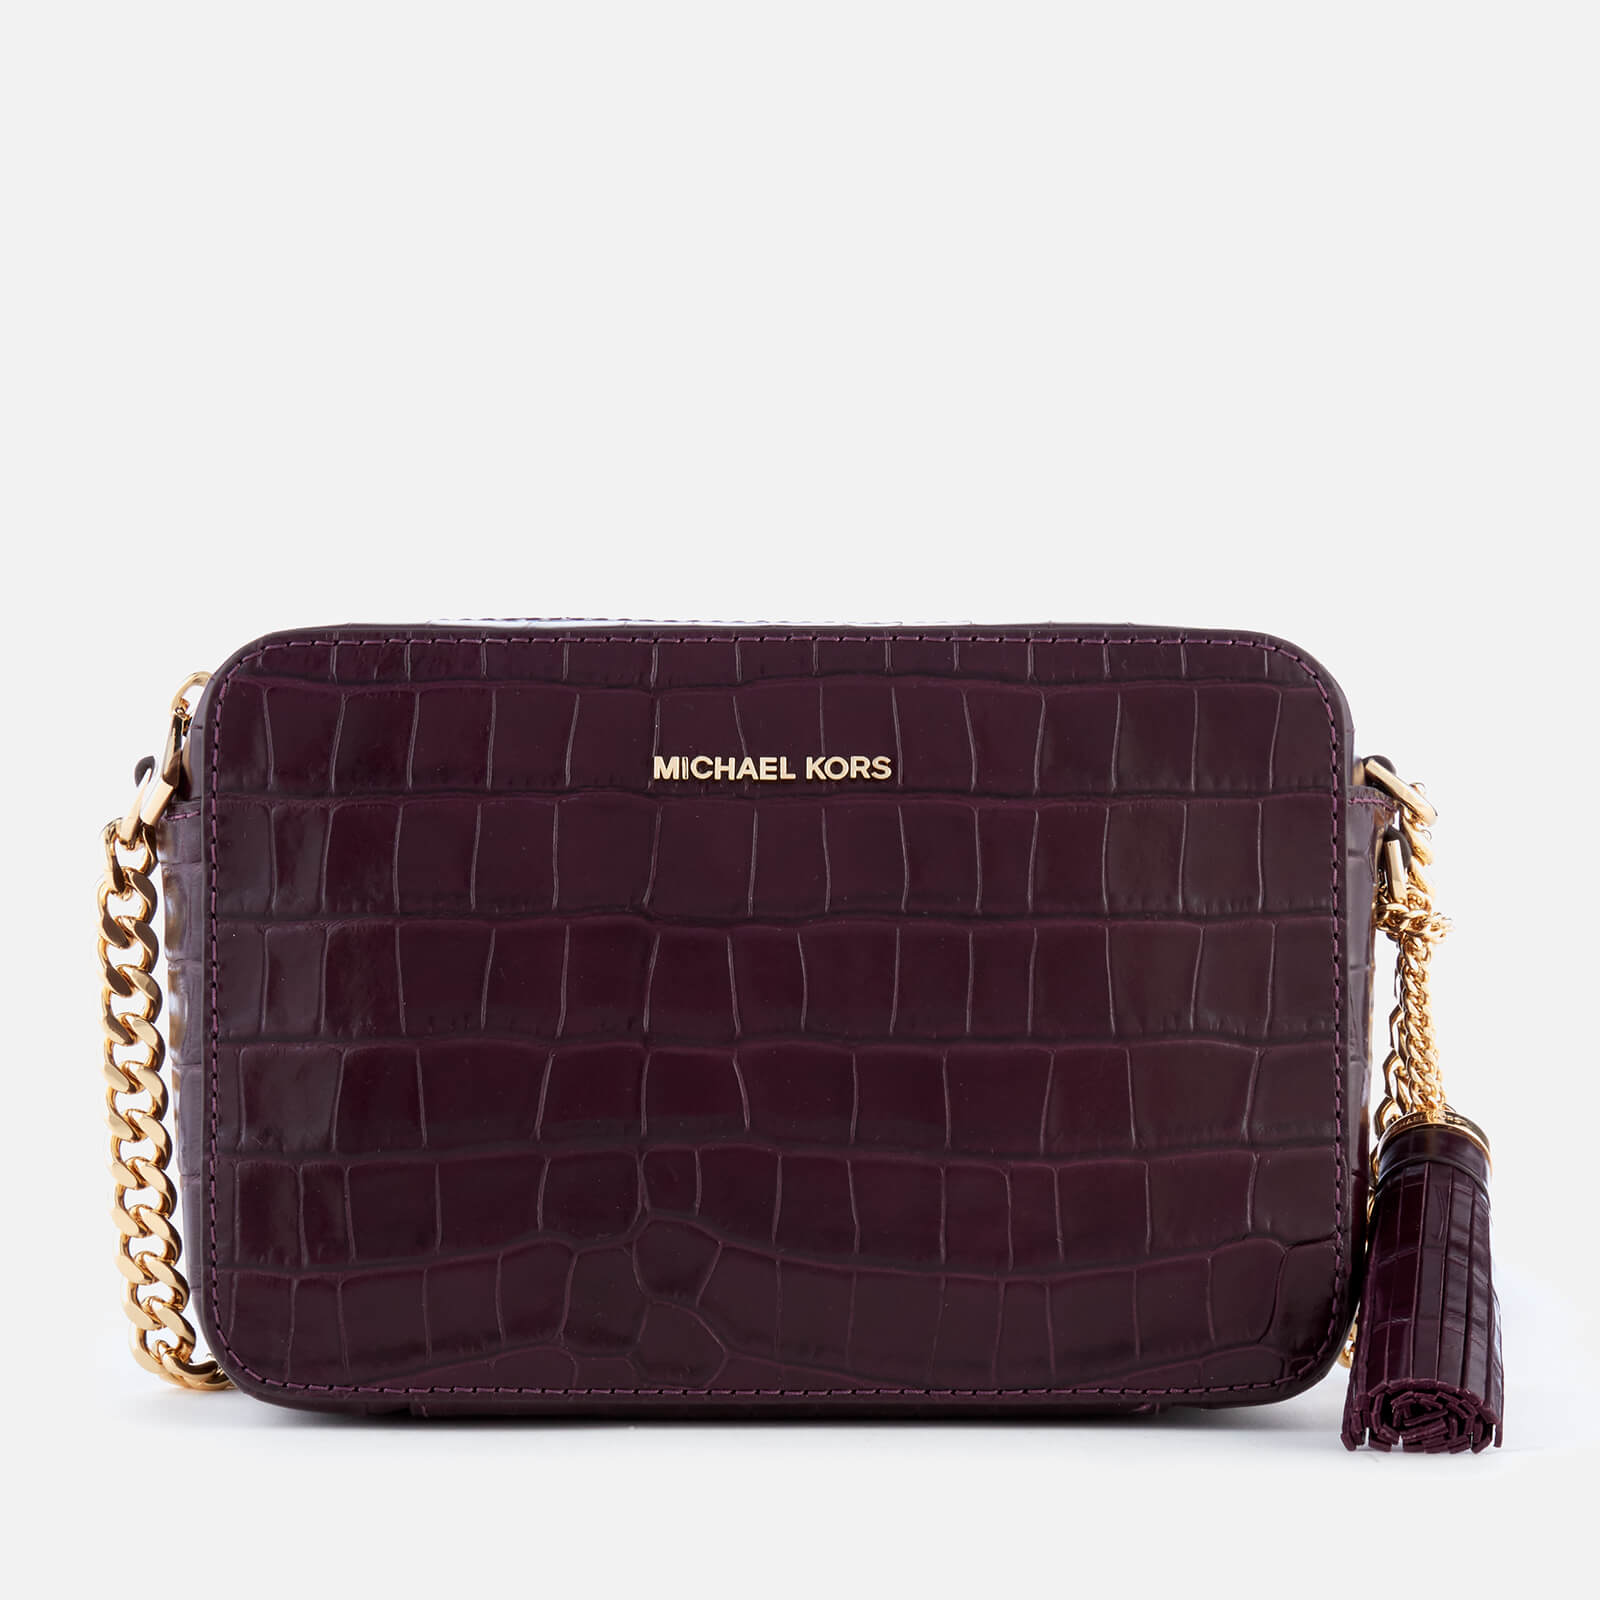 7fe928013758 MICHAEL MICHAEL KORS Women s Ginny Medium Camera Bag - Damson - Free UK  Delivery over £50